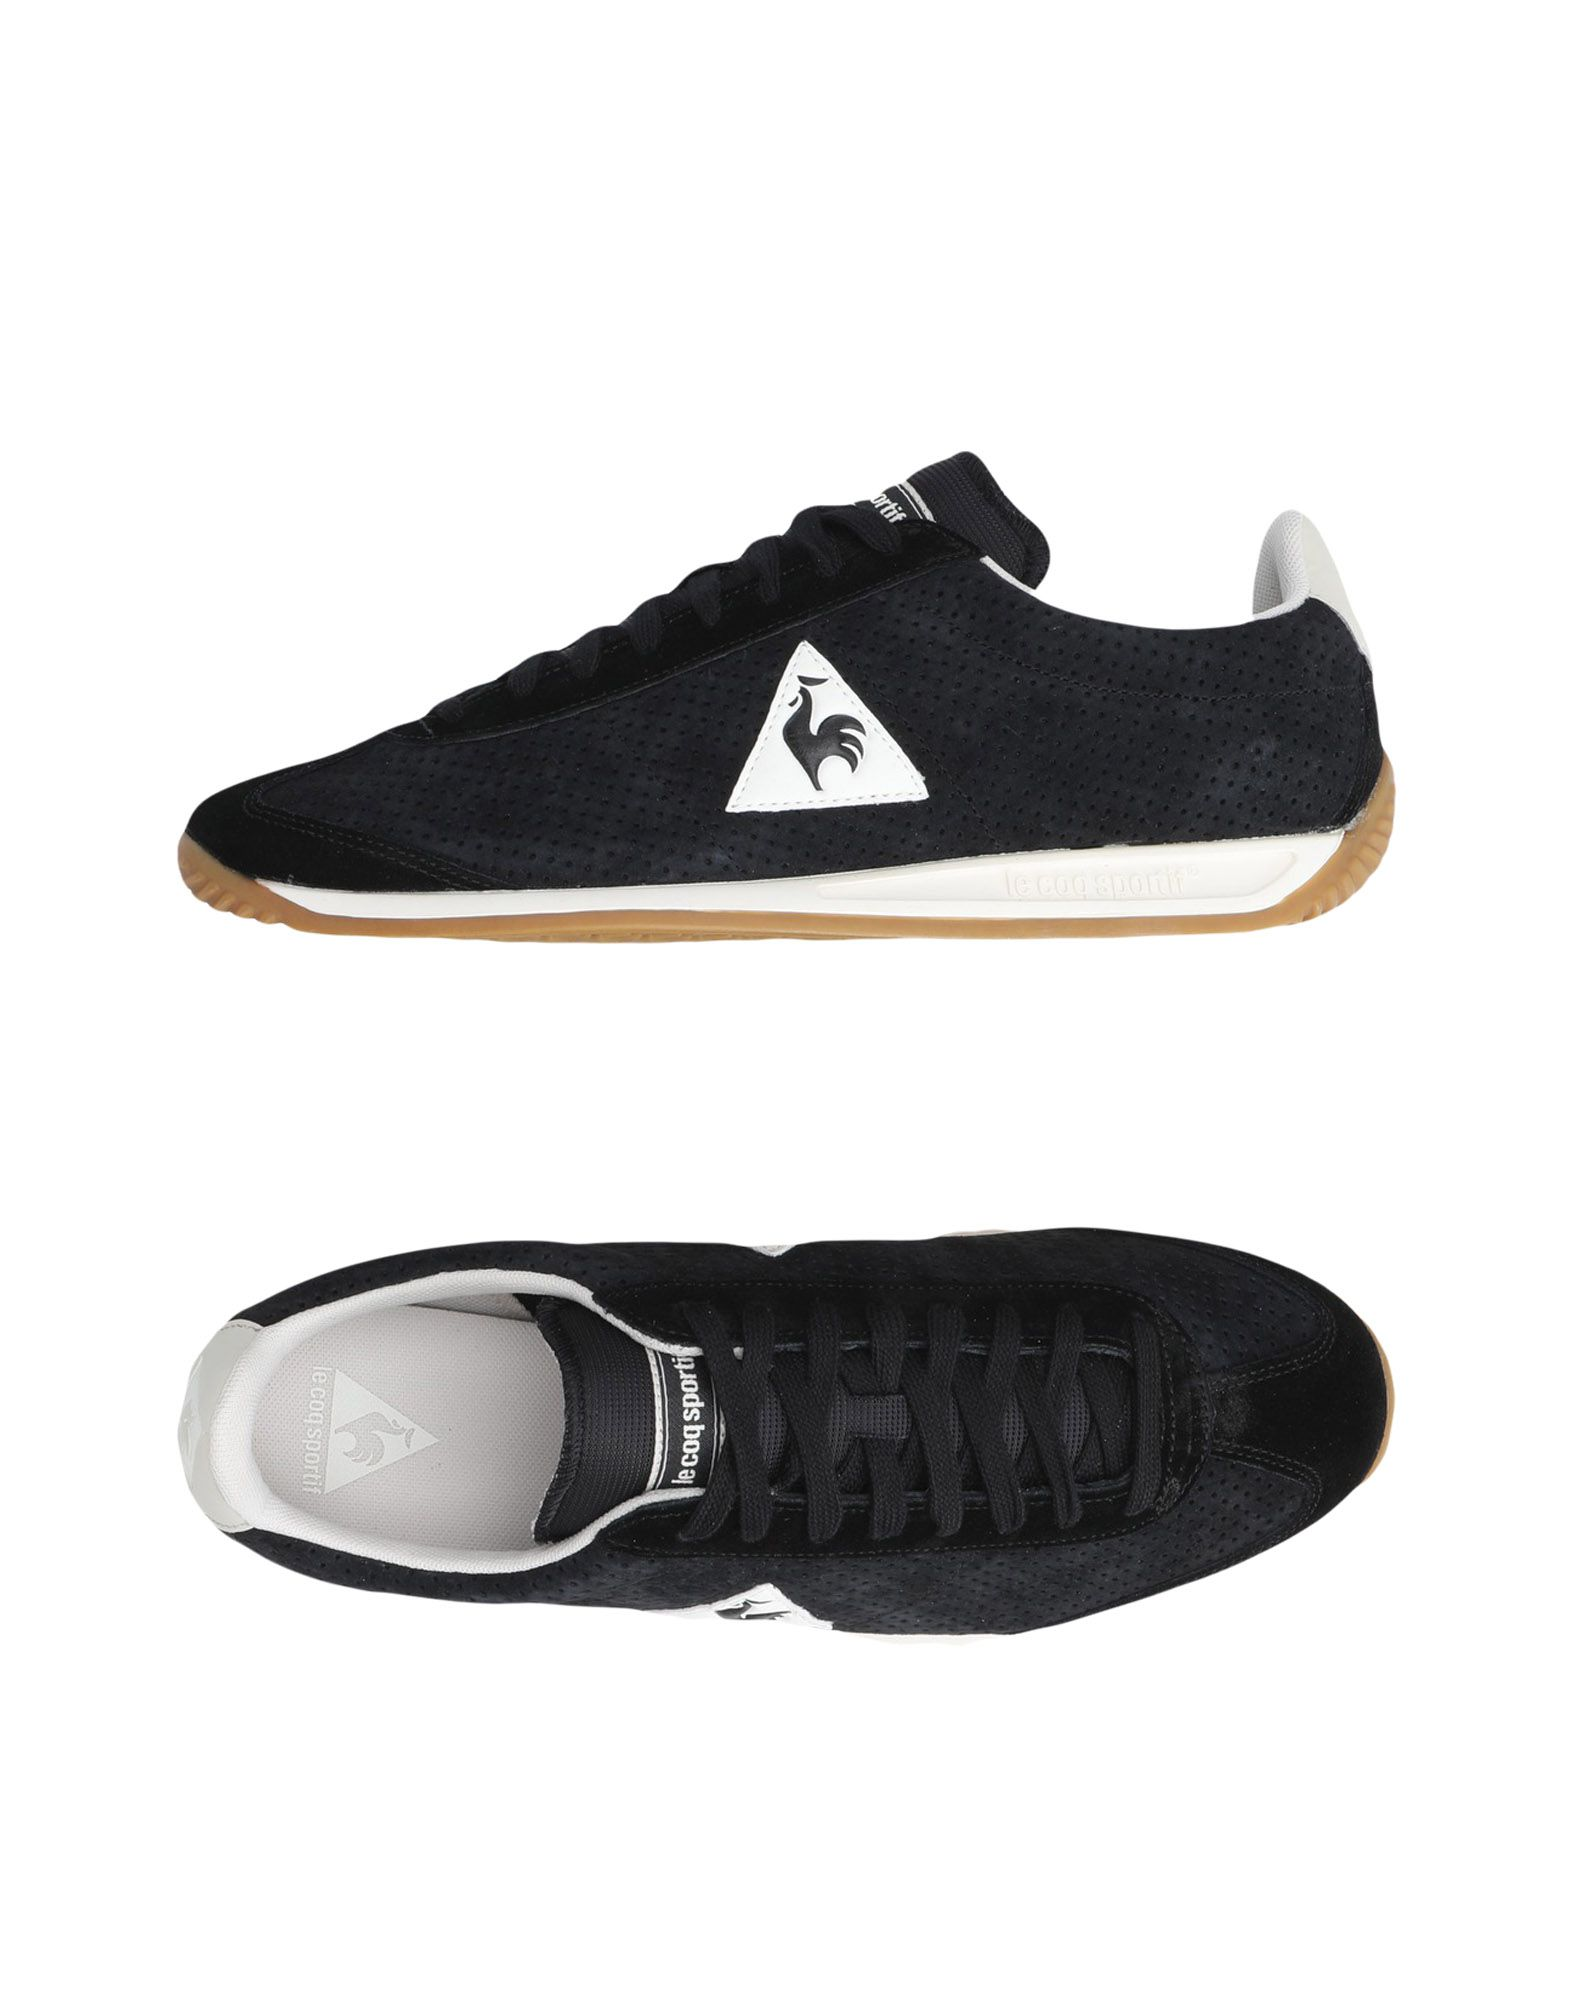 Sneakers Le Coq Sportif Quartz Perforated Nubuck - Uomo - 11340655XJ